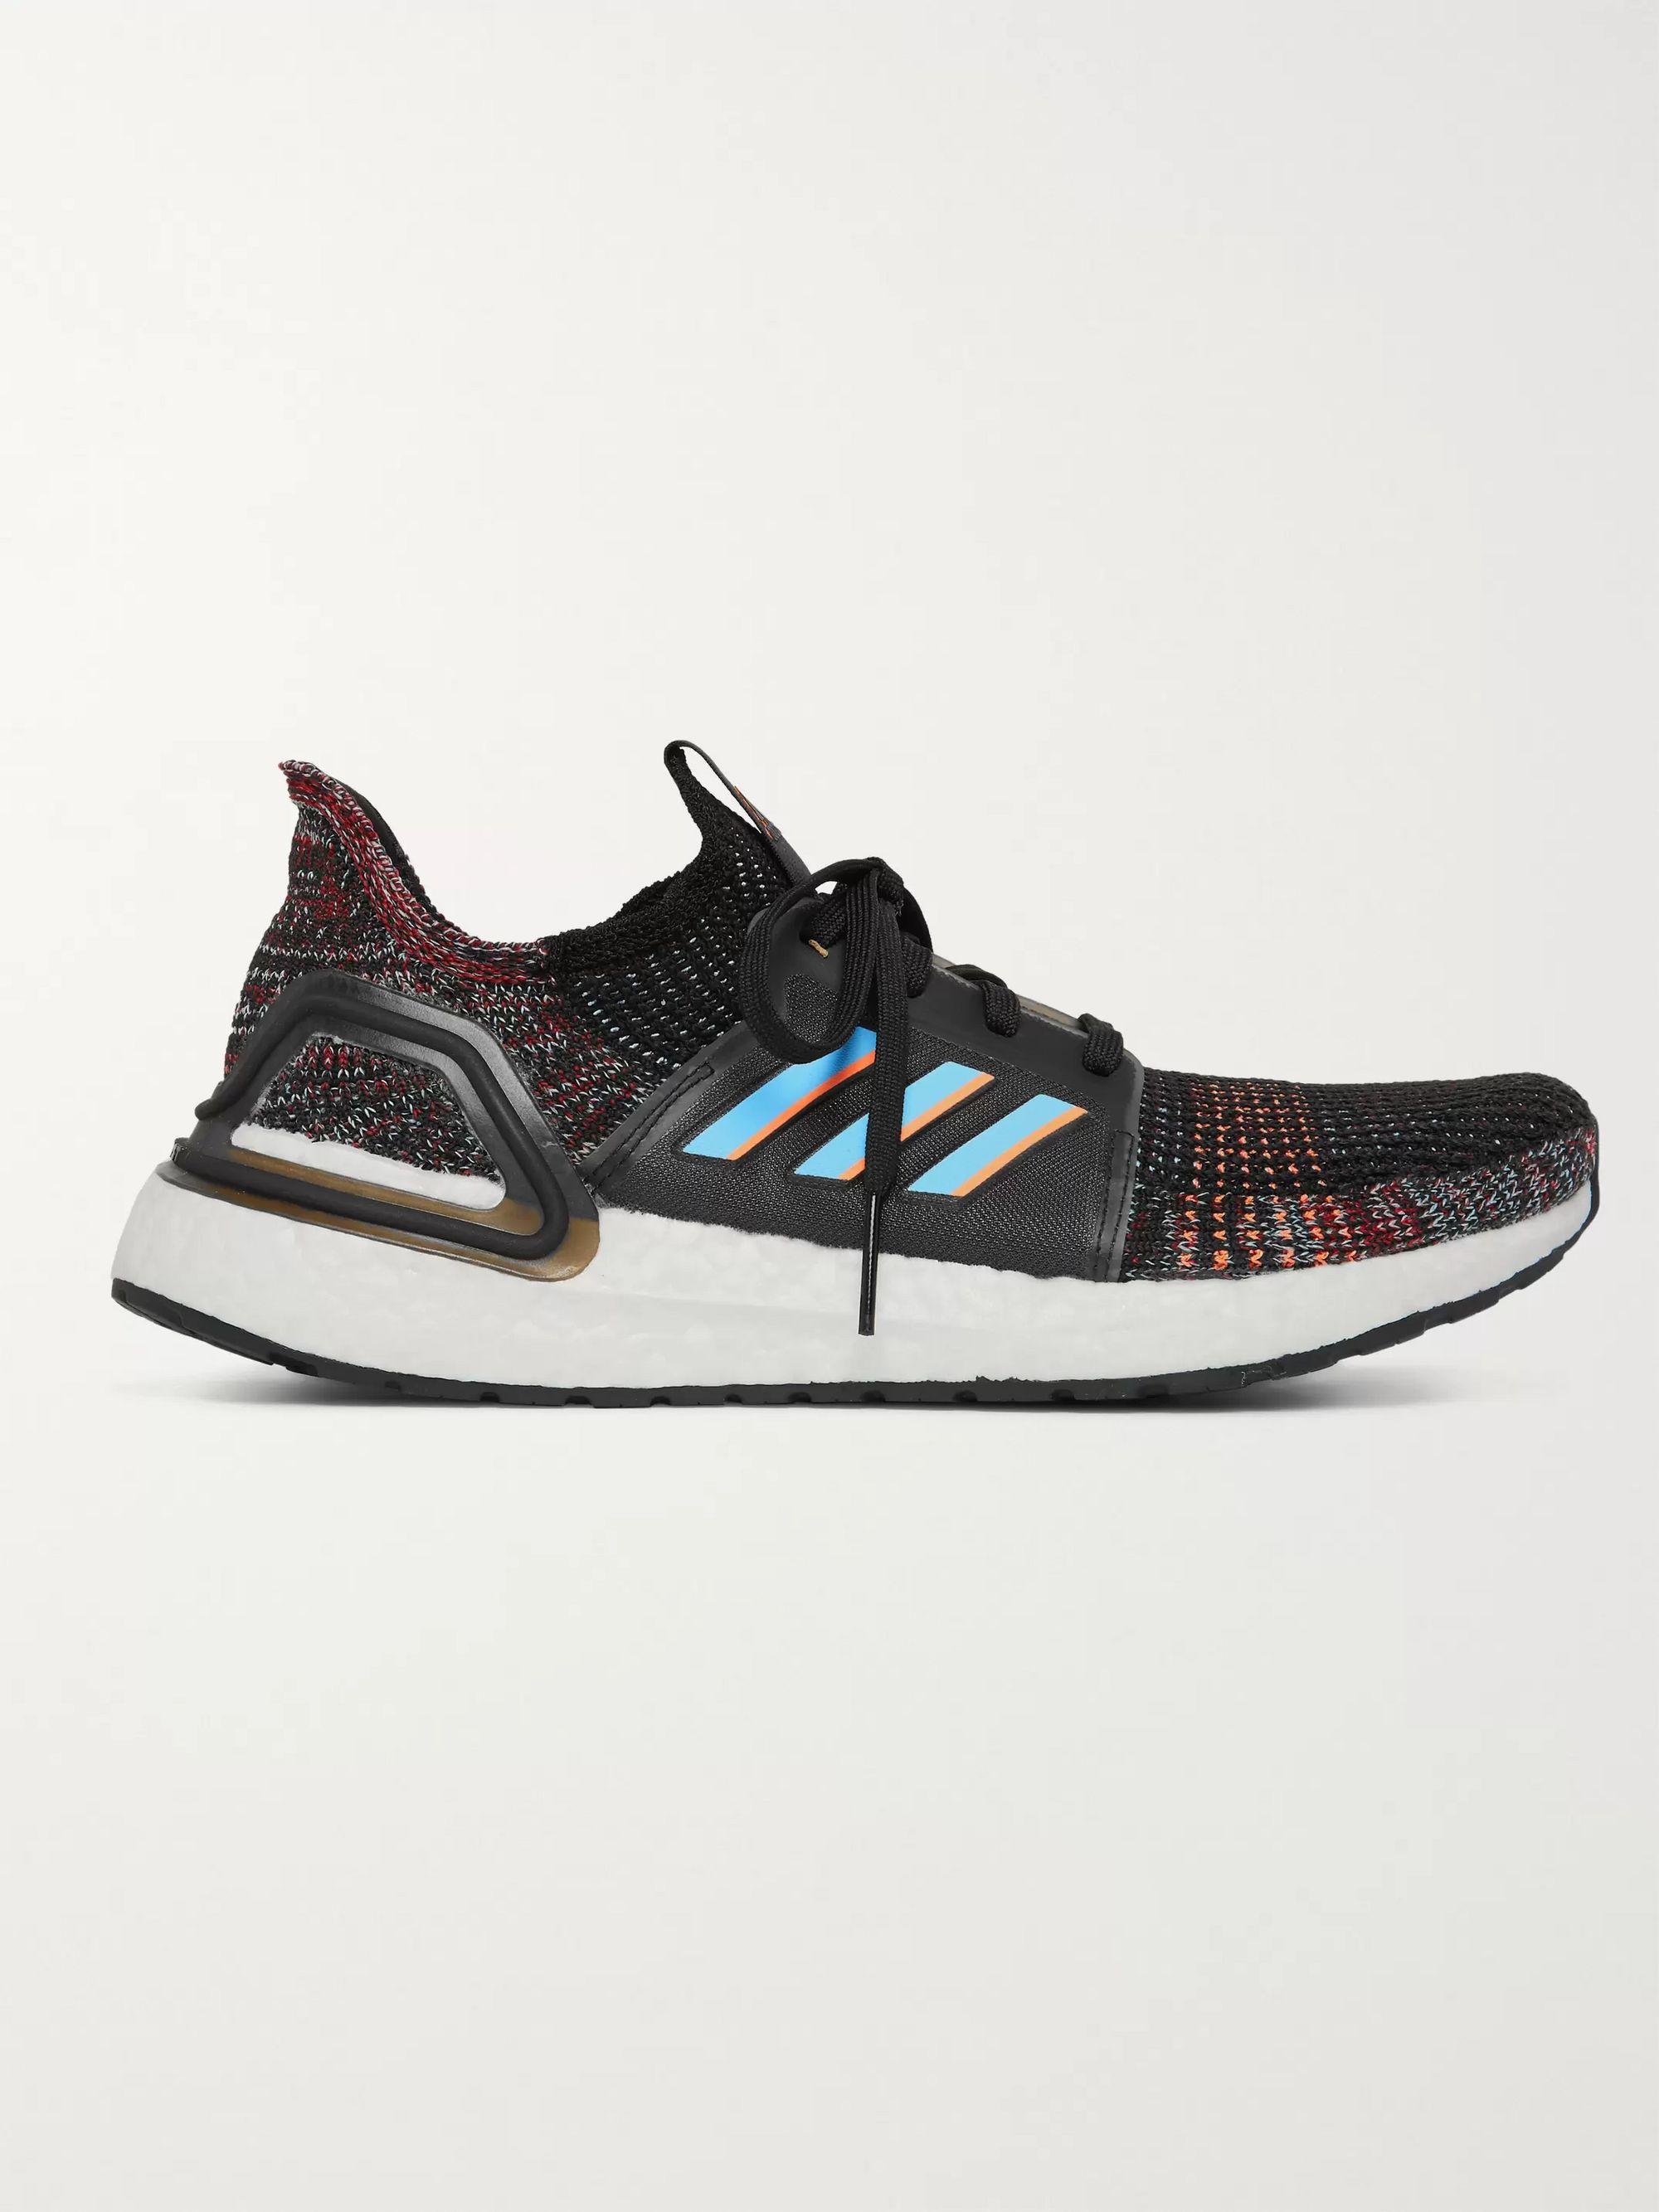 adidas UltraBOOST 19 (black multicolor) | 43einhalb Sneaker Store